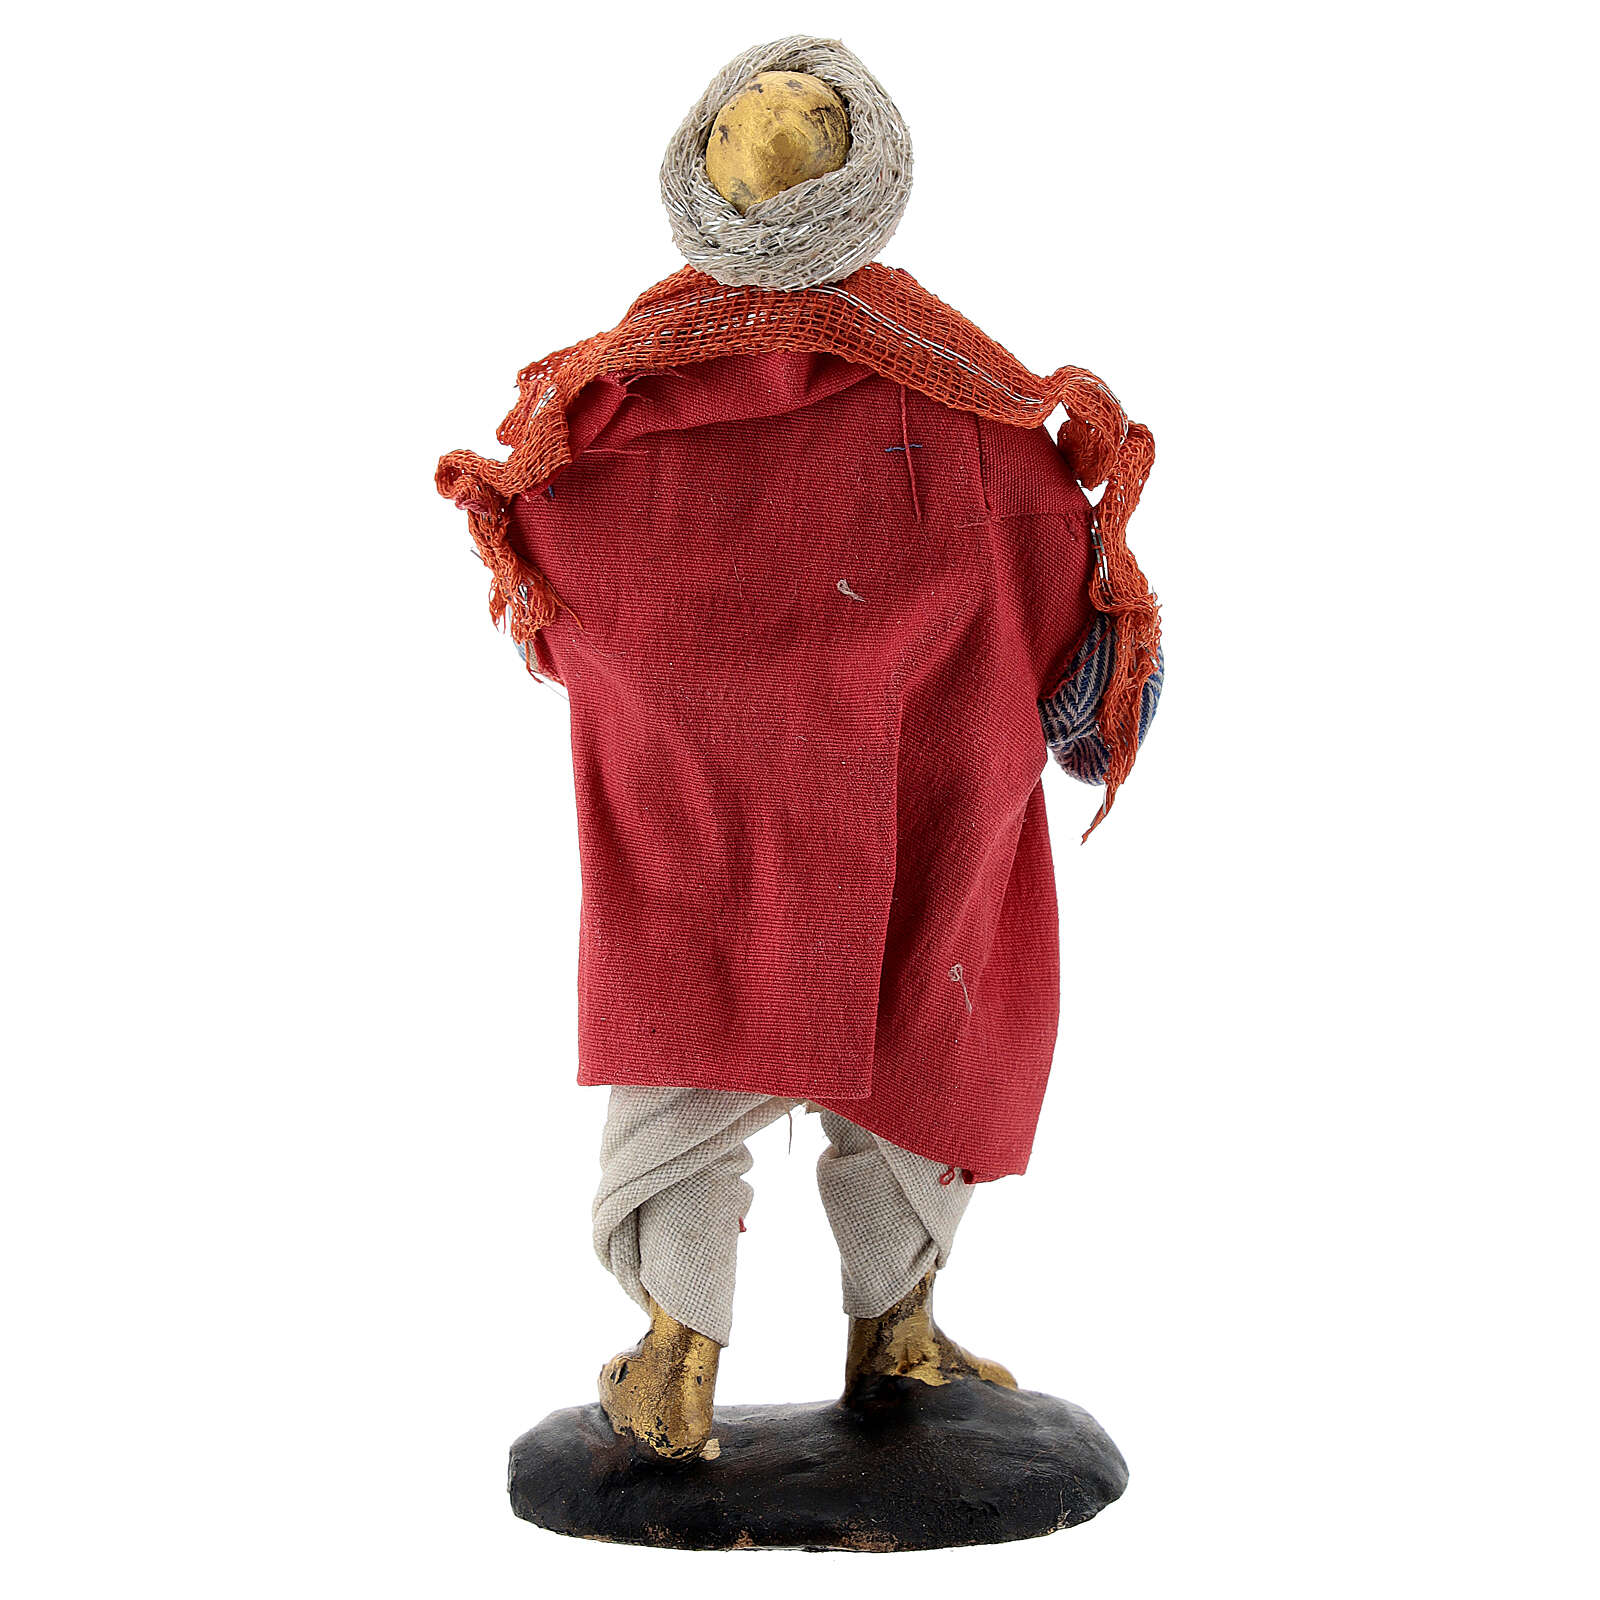 Tocador arpa belén napolitano 12 cm estatua terracota 4